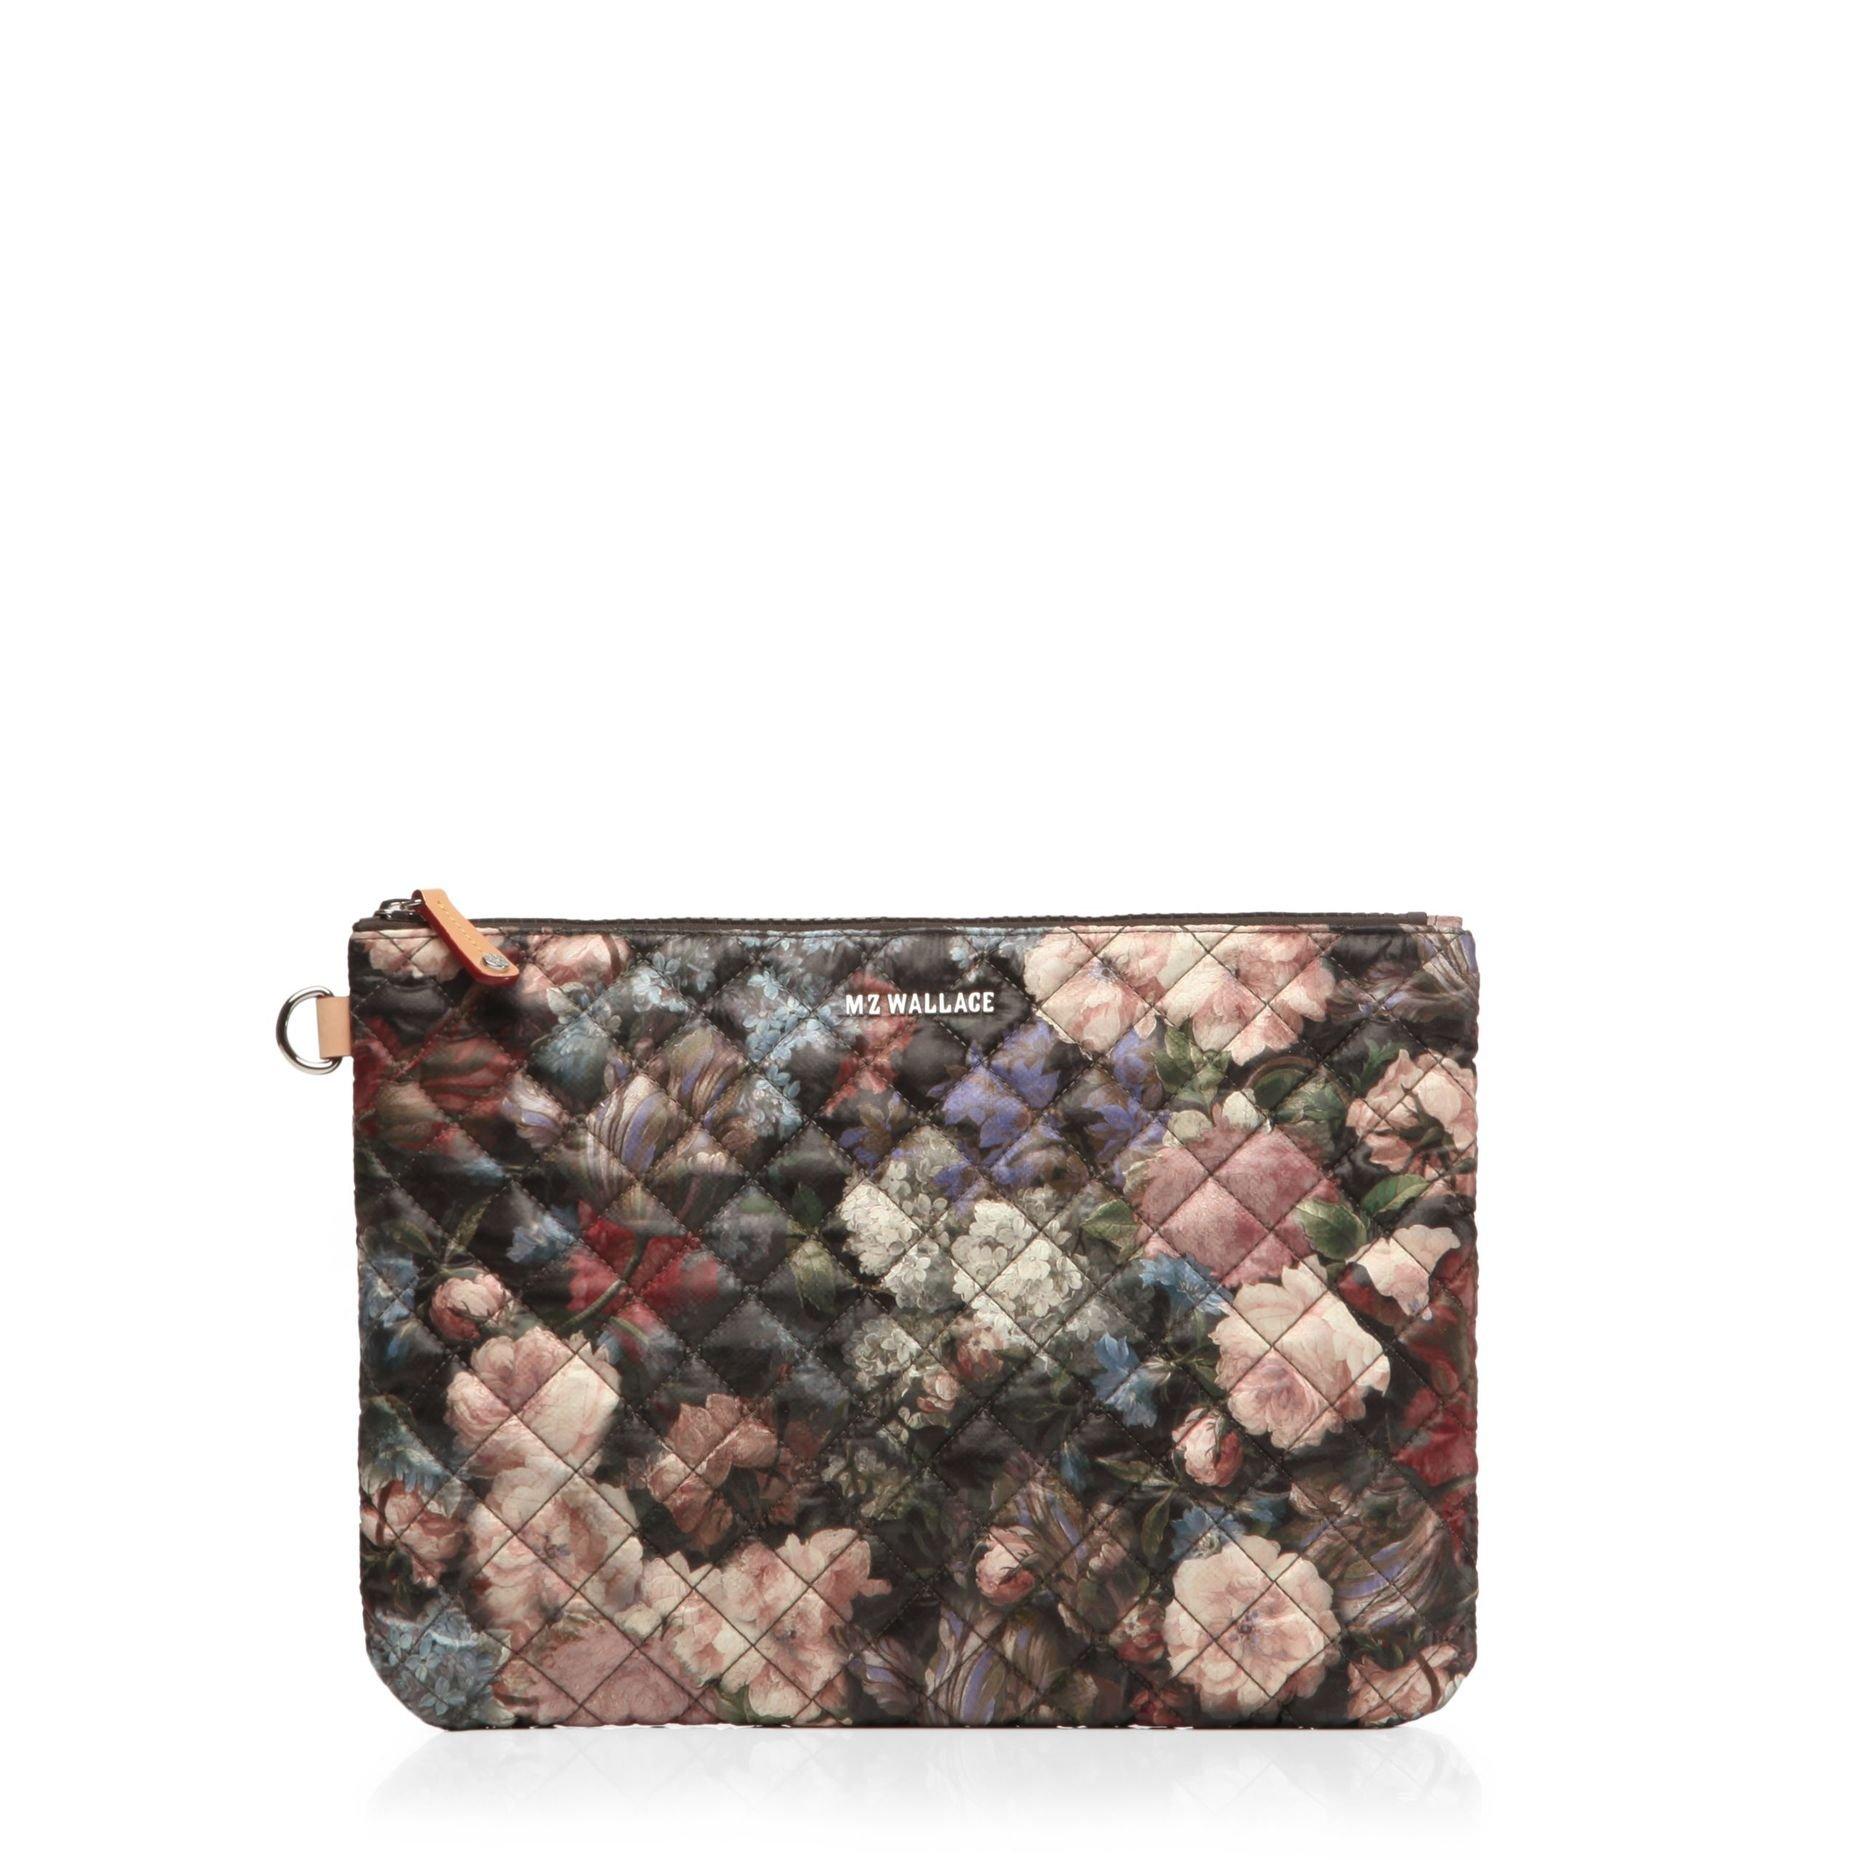 mz wallace night garden clutch floral print bag new